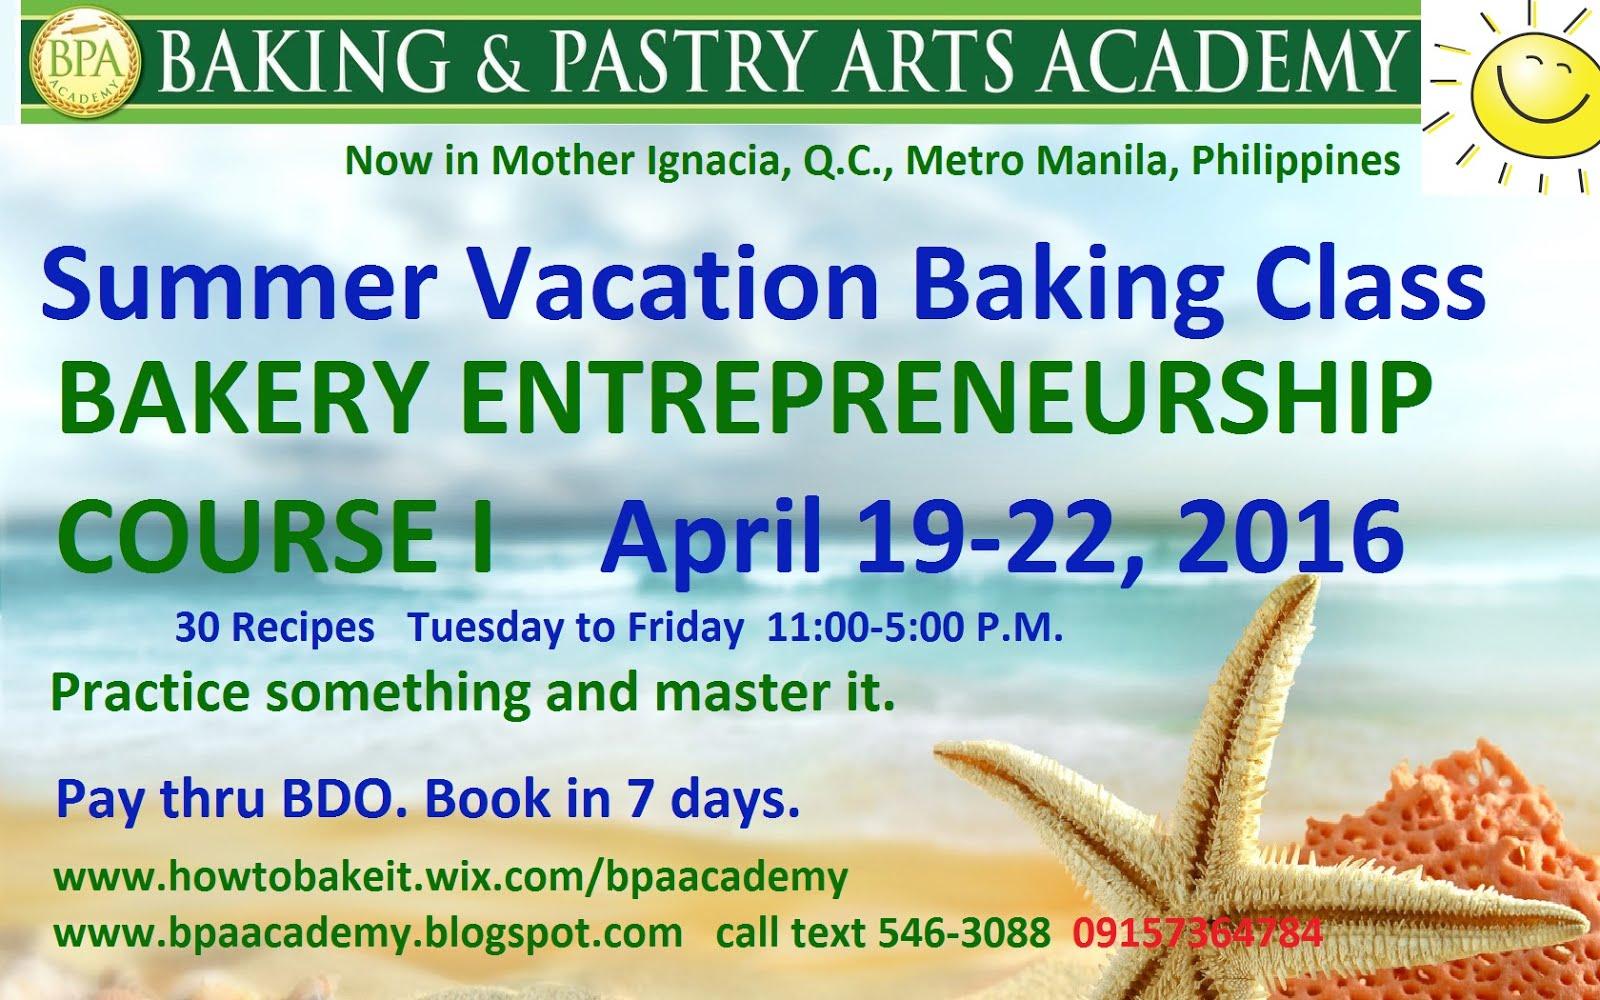 Join Batch 41- April 19-22, 2016